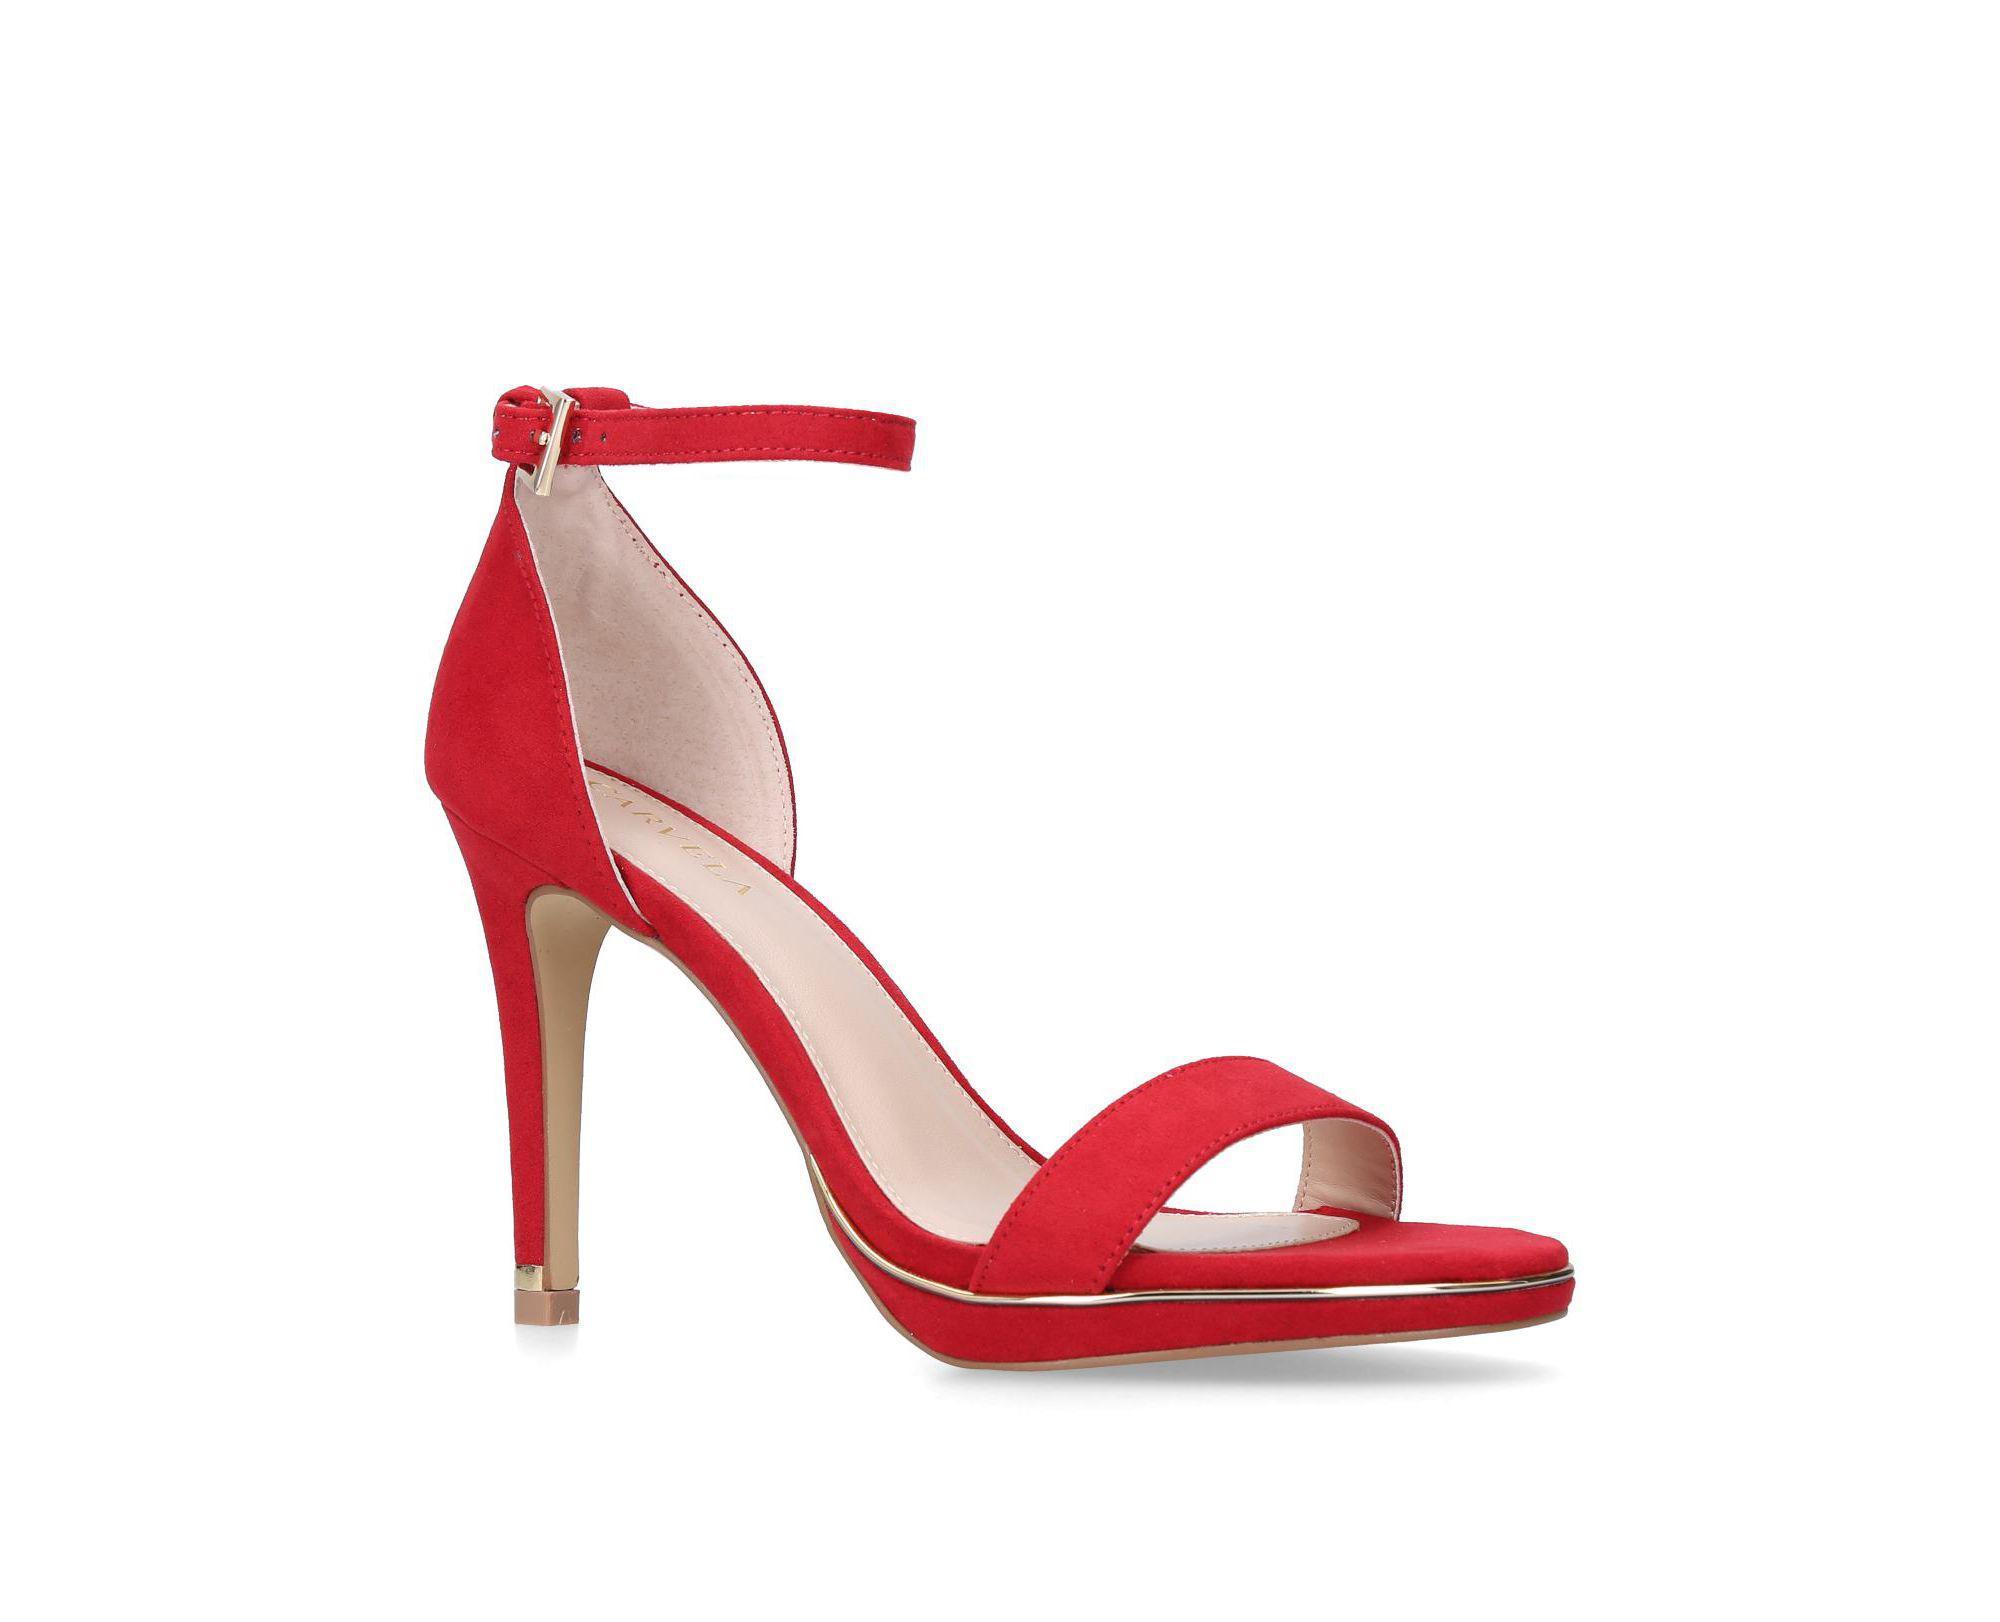 79b62f17280b Carvela Kurt Geiger Red 'leo' Stiletto Heeled Strappy Sandals in Red ...